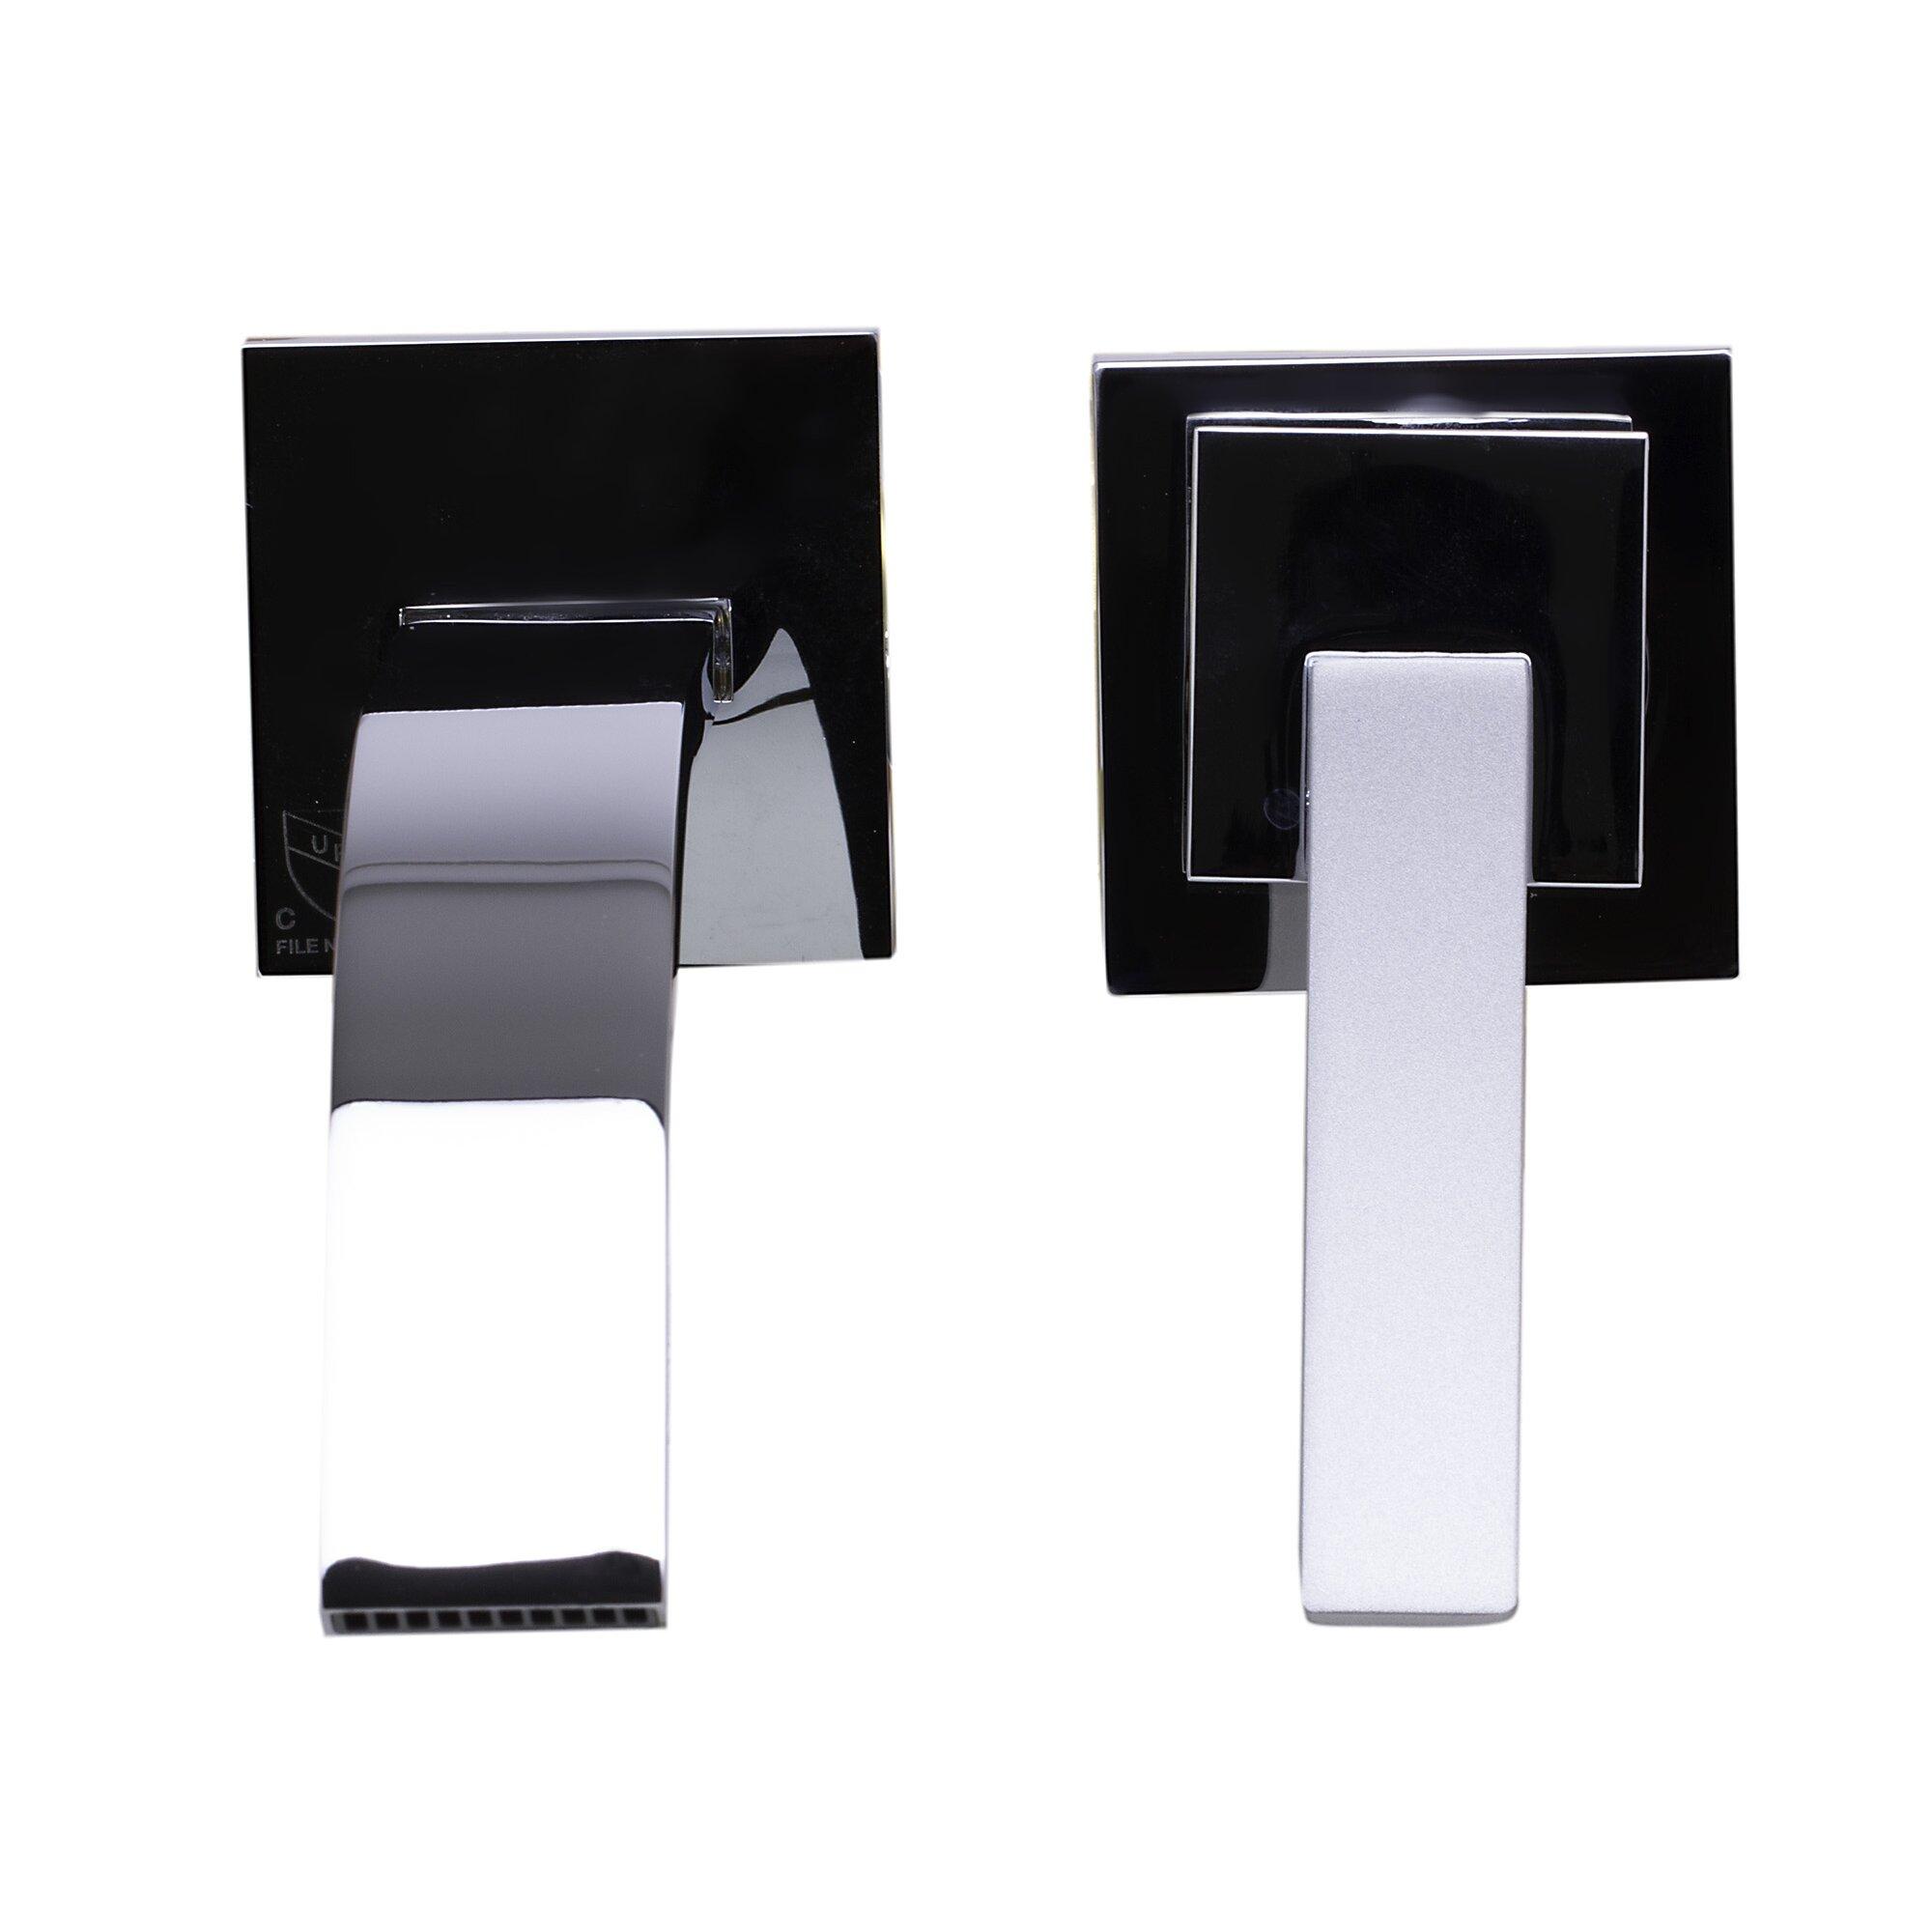 Wall Bathroom Faucet Alfi Brand Single Handle Wall Mounted Bathroom Faucet Reviews